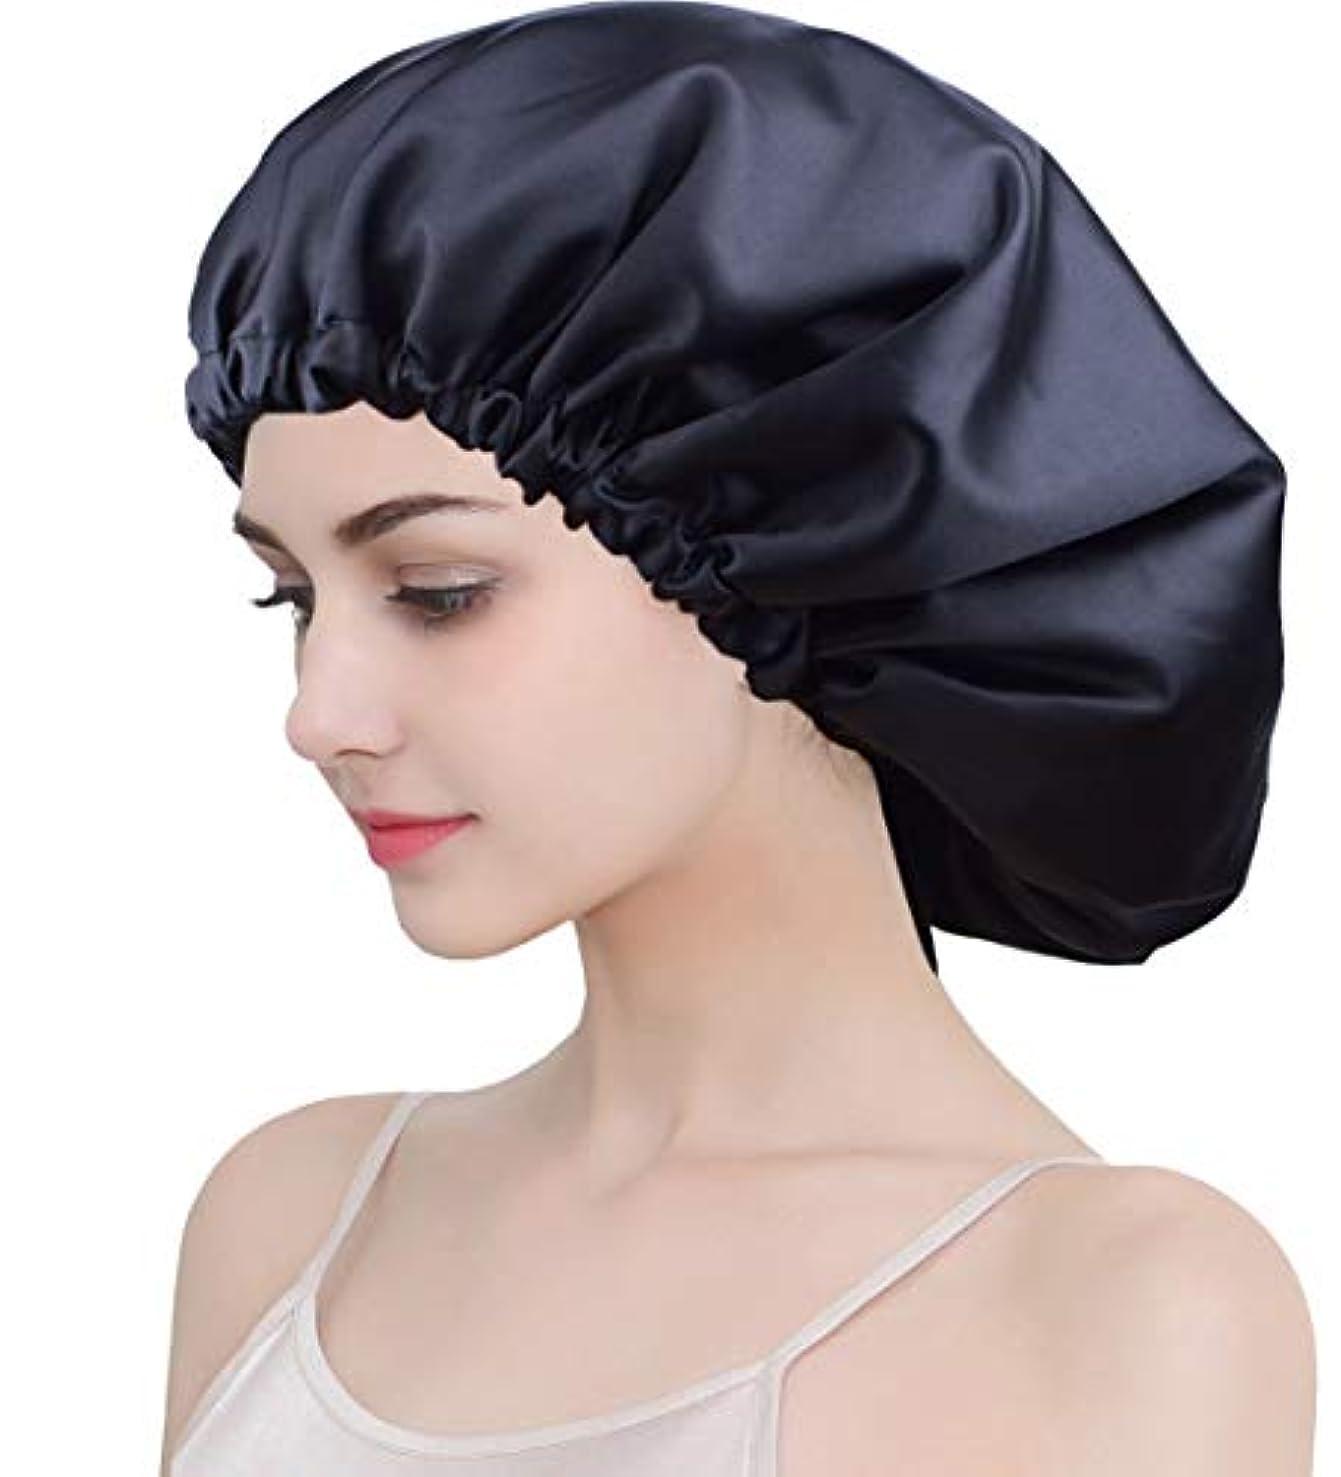 Extra Large Sleep Bonnet Cap for Women, Black Satin Bonnet Cap for Sleeping, Double Layer, Adjustable Night Hat for Natural Hair Long Braids